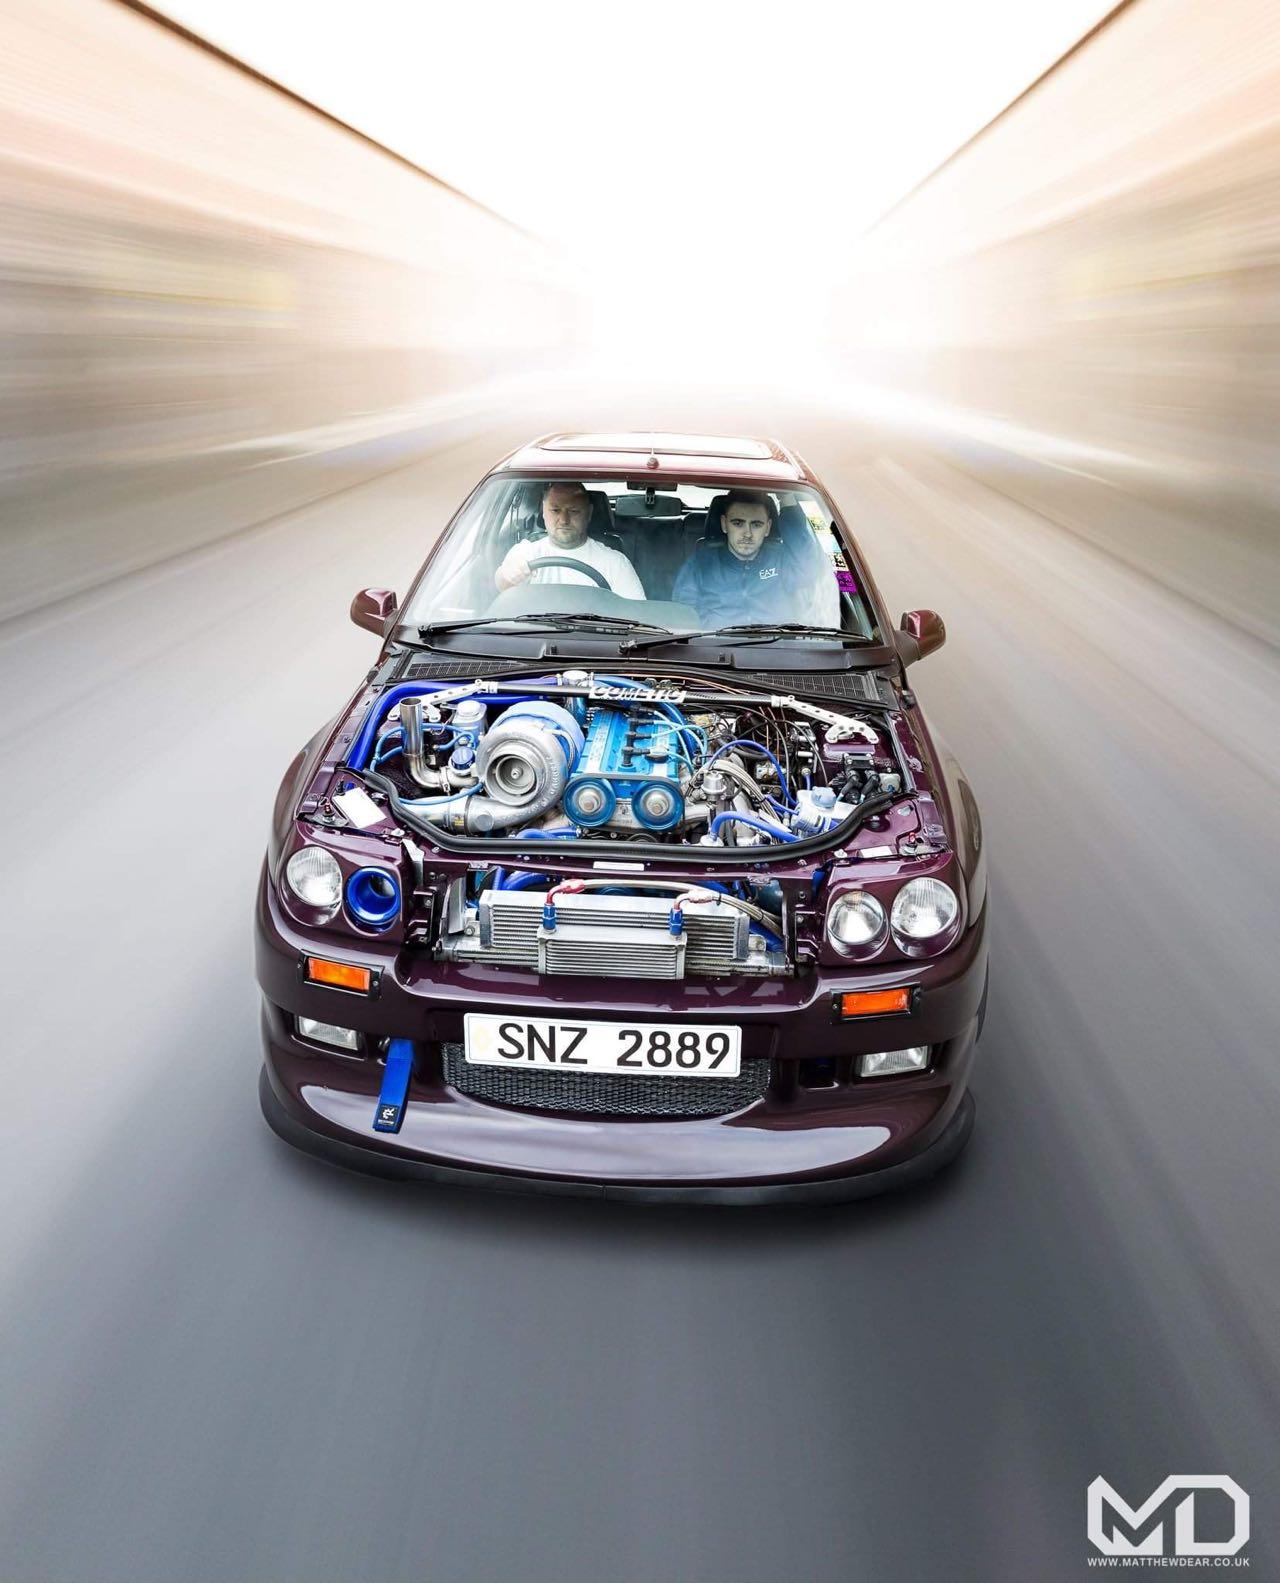 Renault Clio Cosworth... Sont fous ces anglais ! 10